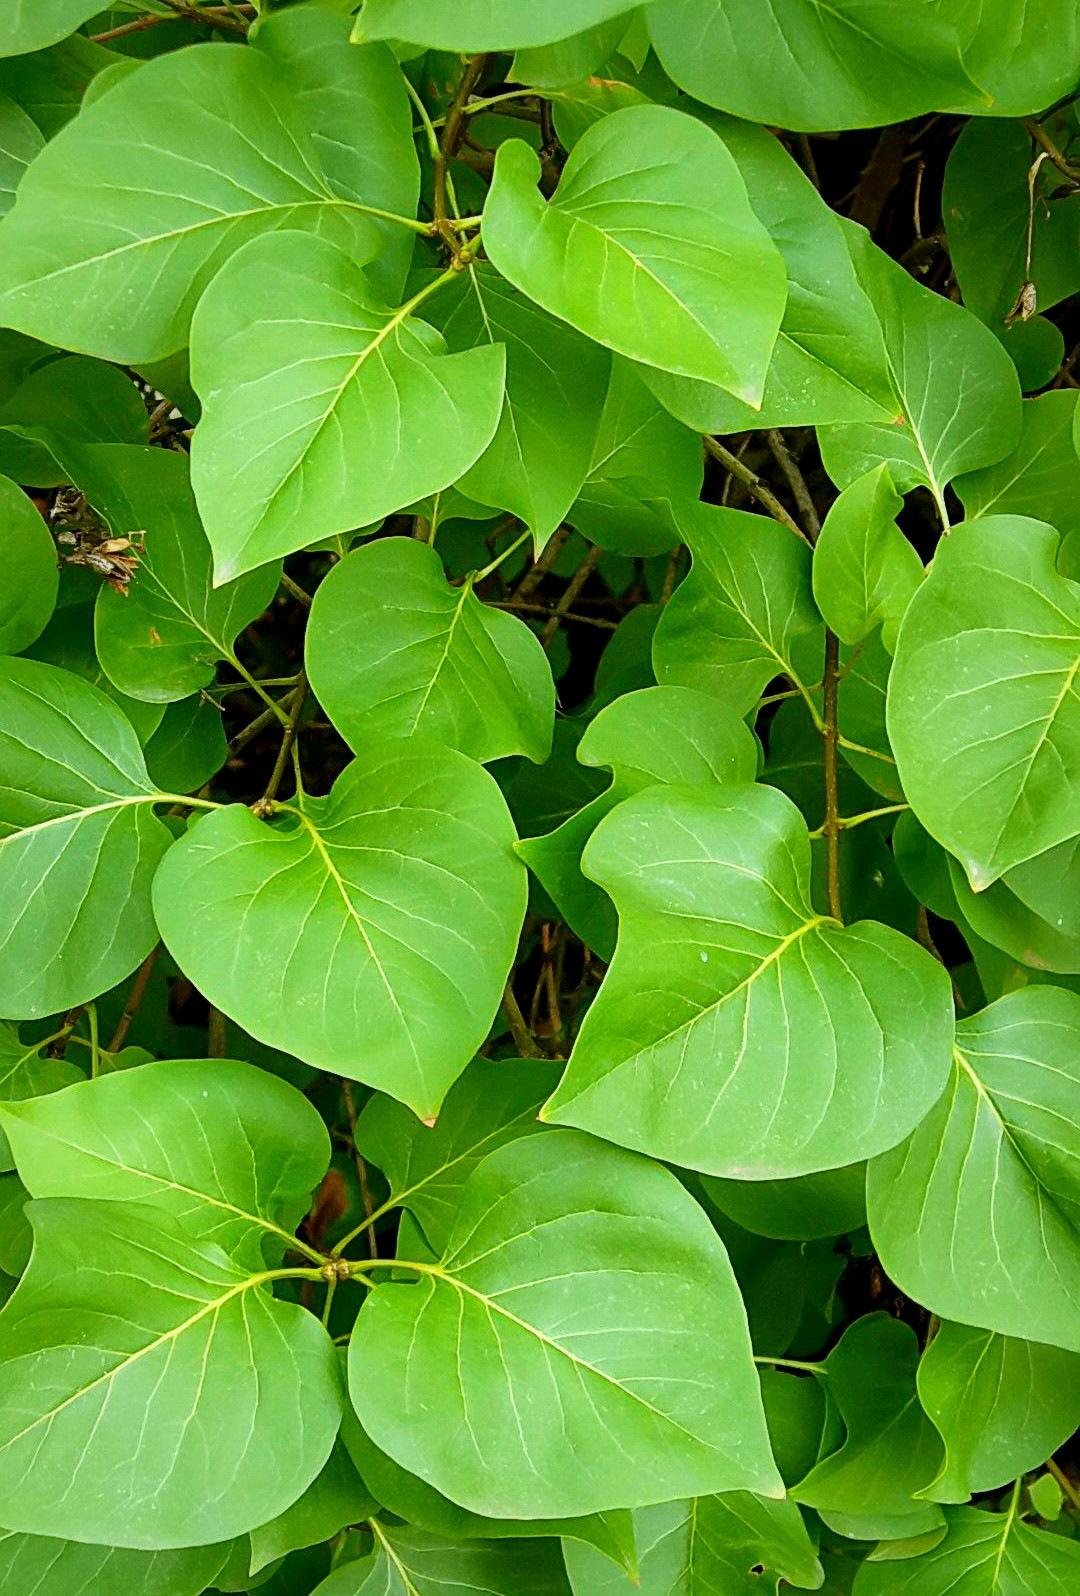 Redbud Leaves - Original by bellamahri